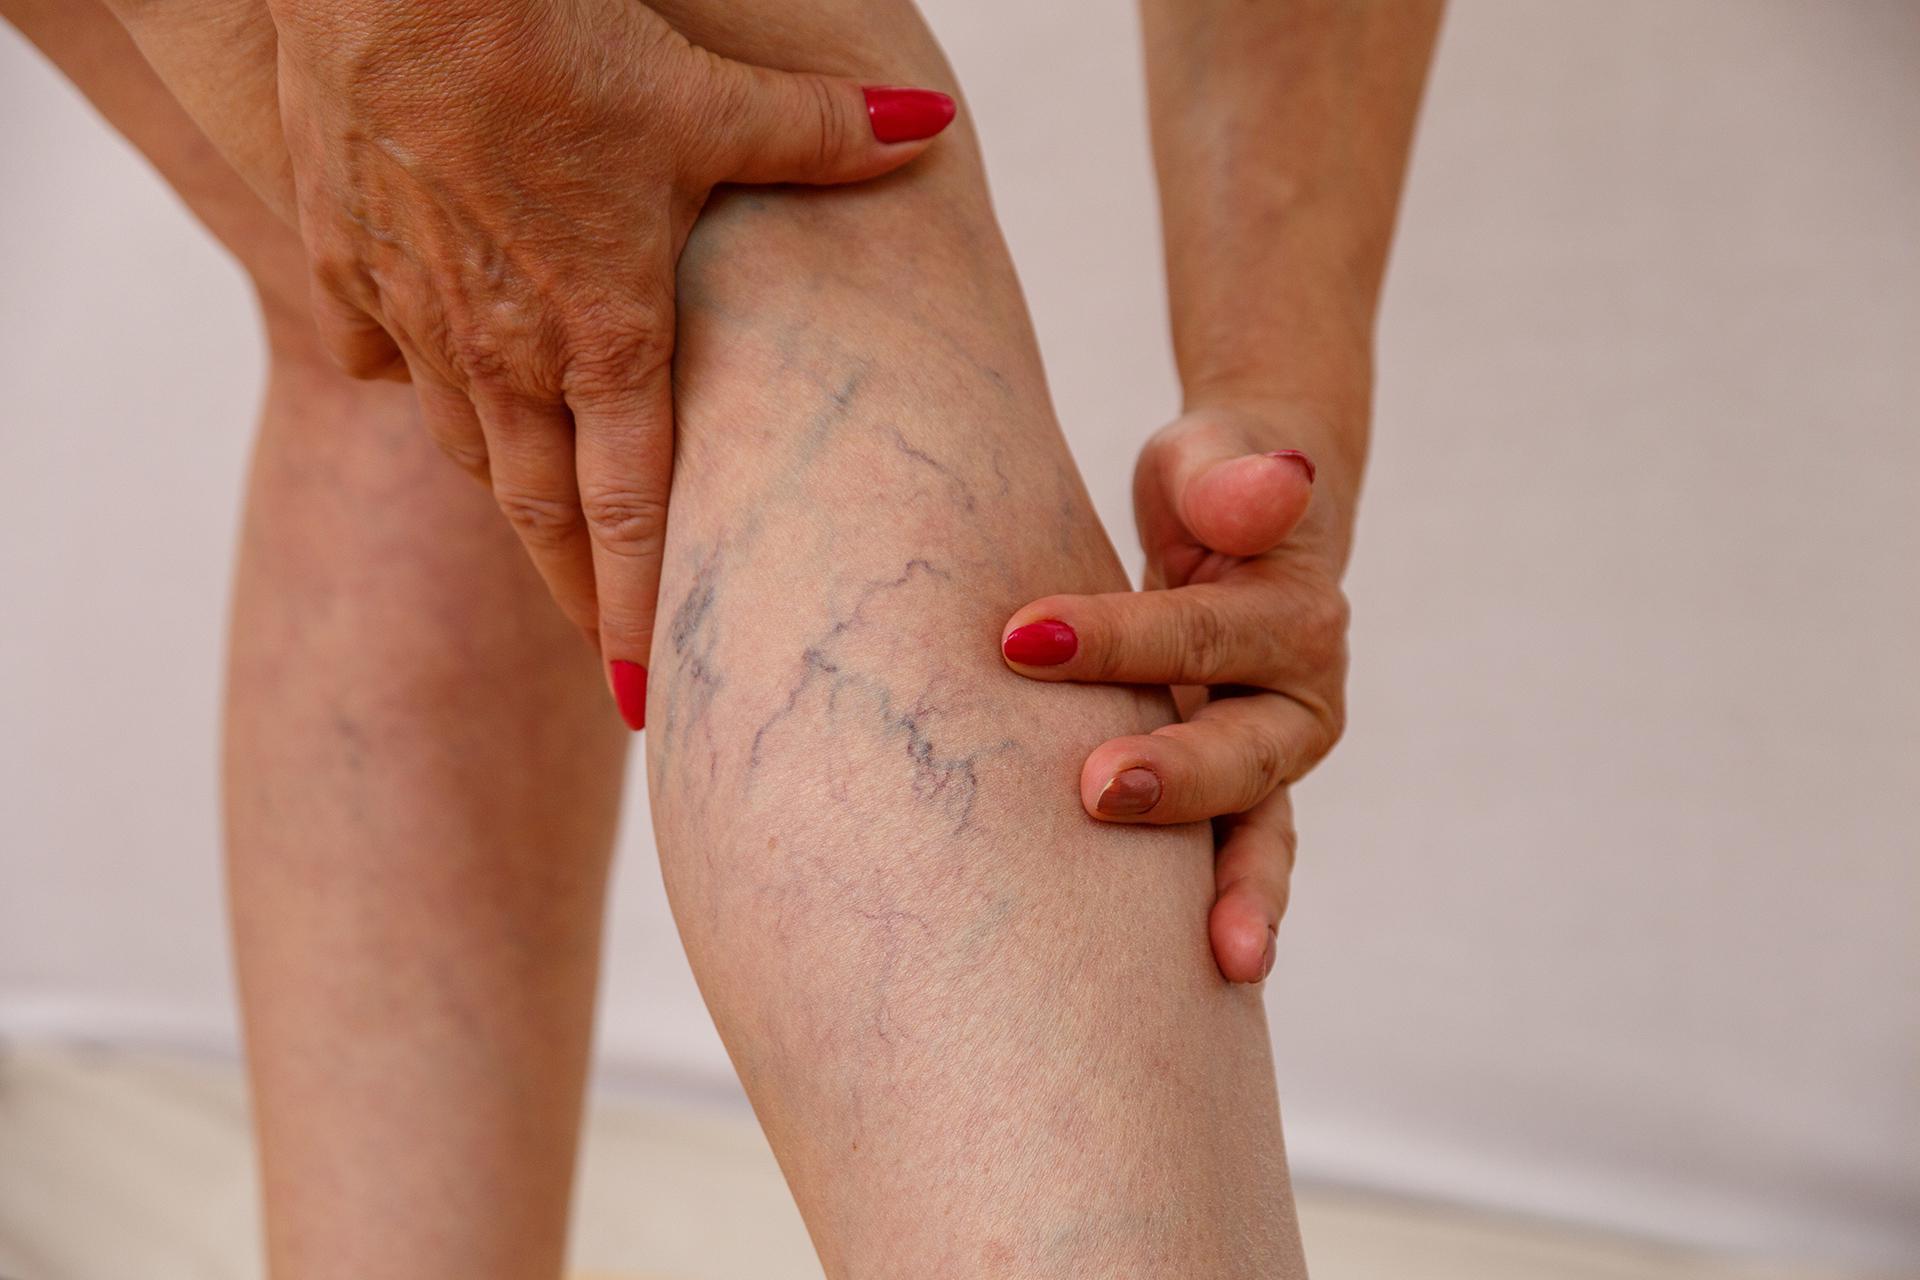 vascular-issues-requiring-leg-pain-doctor-Rosemead